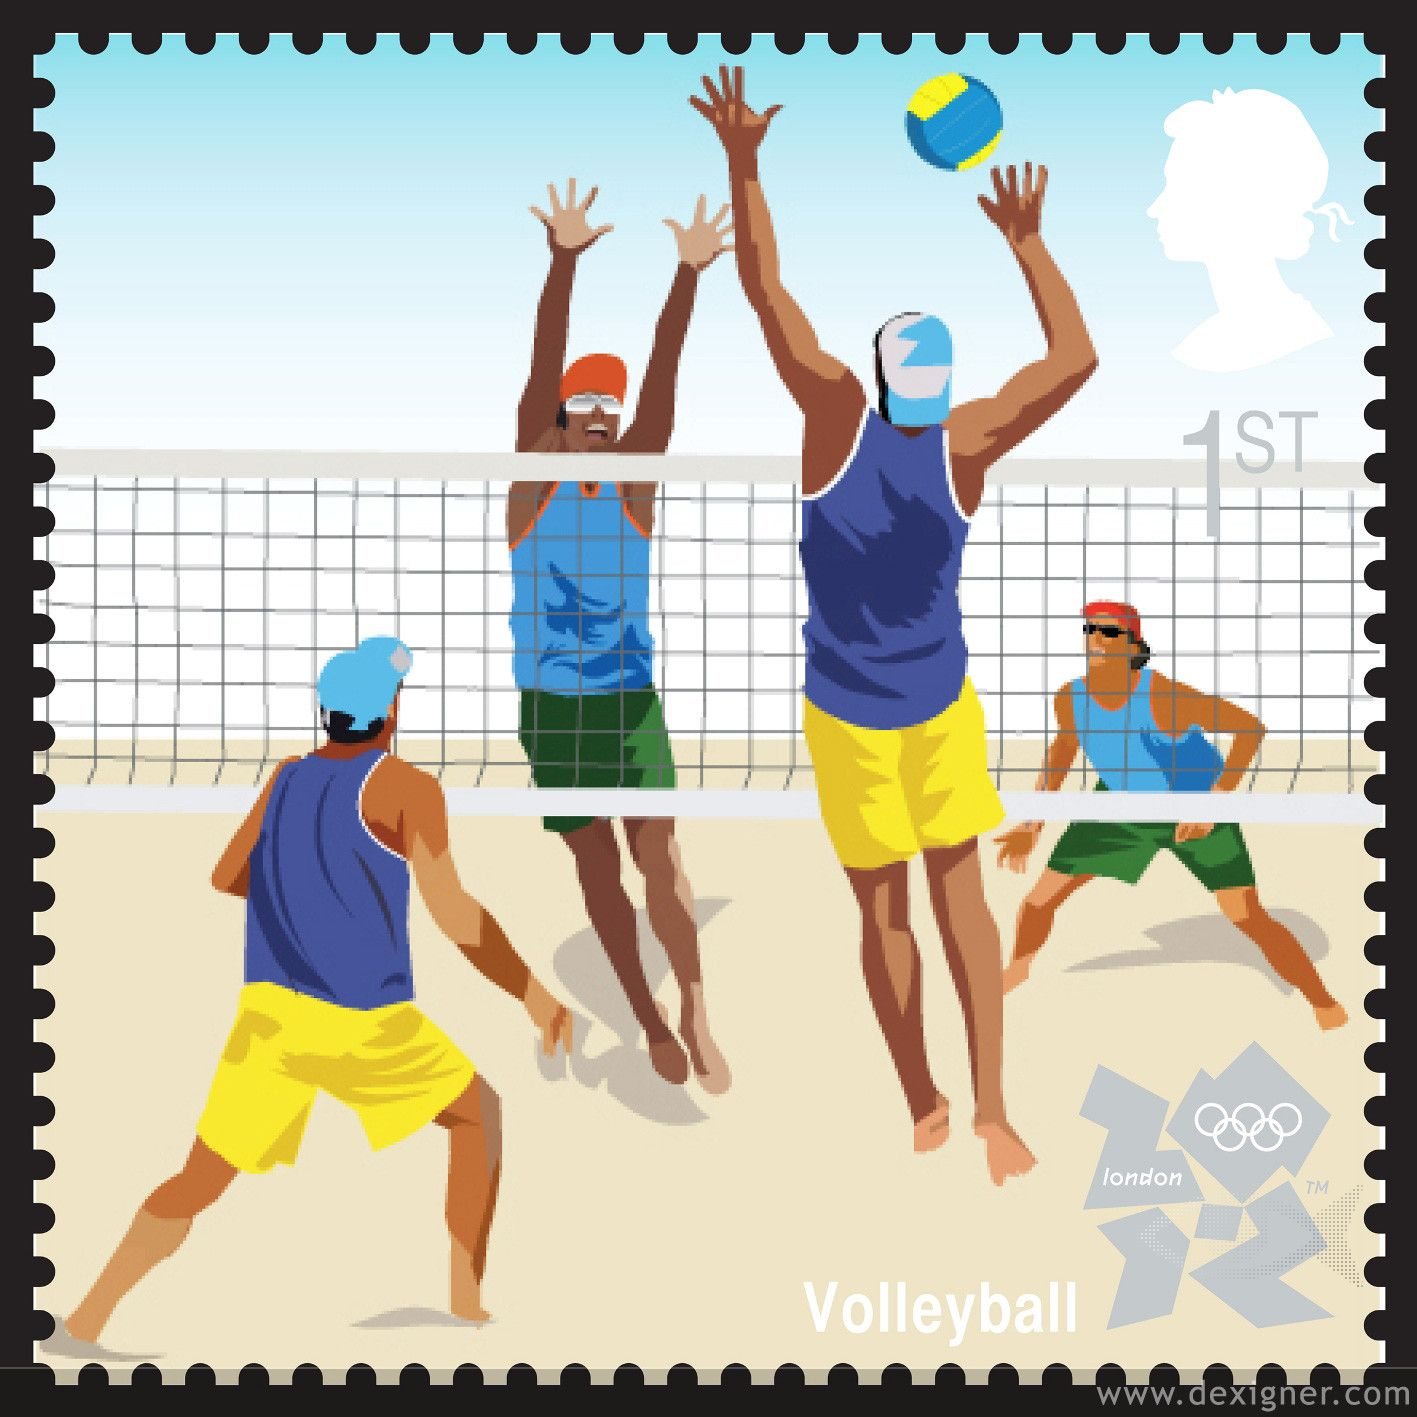 Third Series Of London 2012 Olympic Stamps By Studio David Hillman Con Imagenes Volleyball De Playa Estampilla Postal Sellos